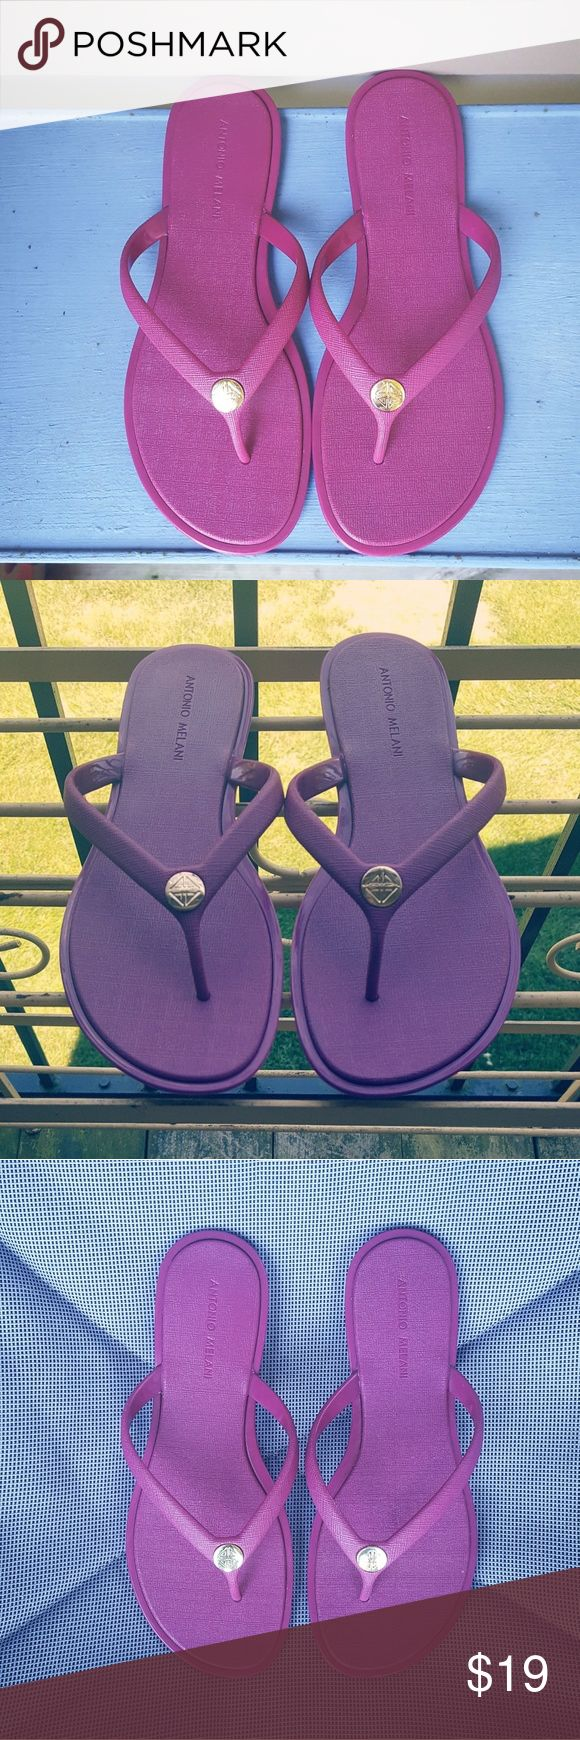 ANTONIO MELANI Magenta / Purple Flip Flops Antonio Melani Rubbery Sandals With Gold Emblem  Size 7  Awesome Condition!  Flat - no heel  Thanks for reading & have a pleasant day! ANTONIO MELANI Shoes Sandals